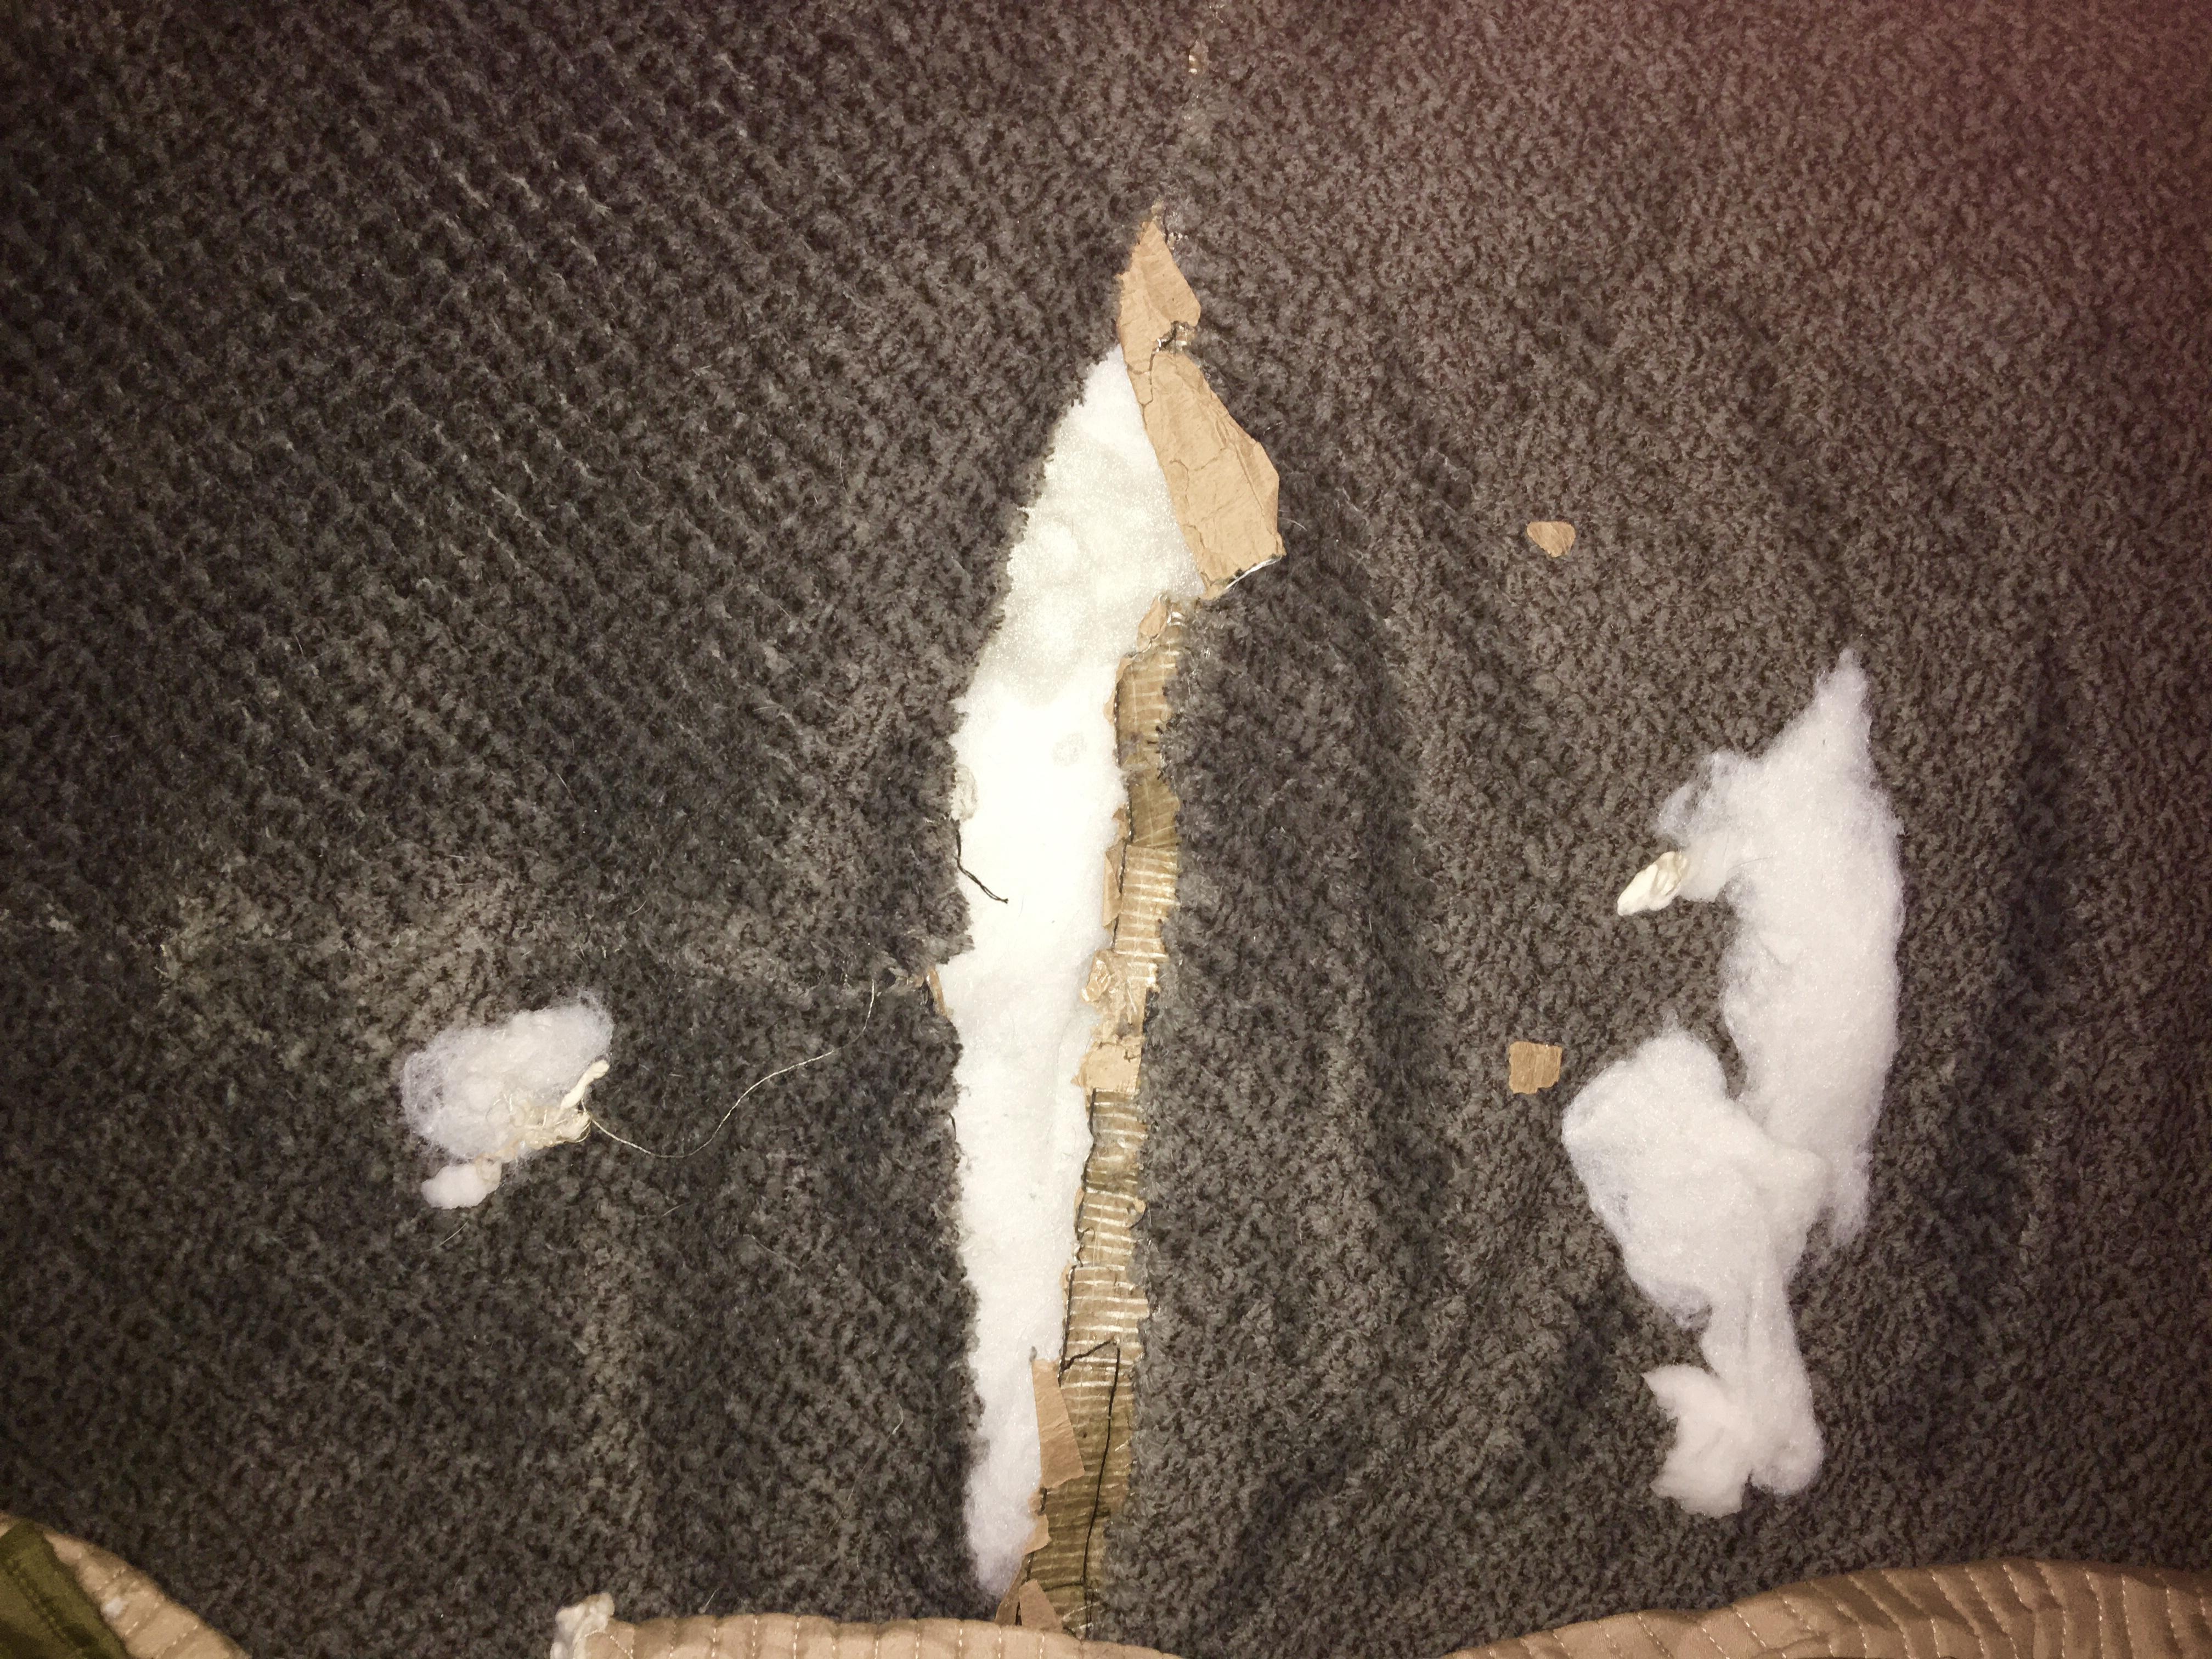 dog destruction